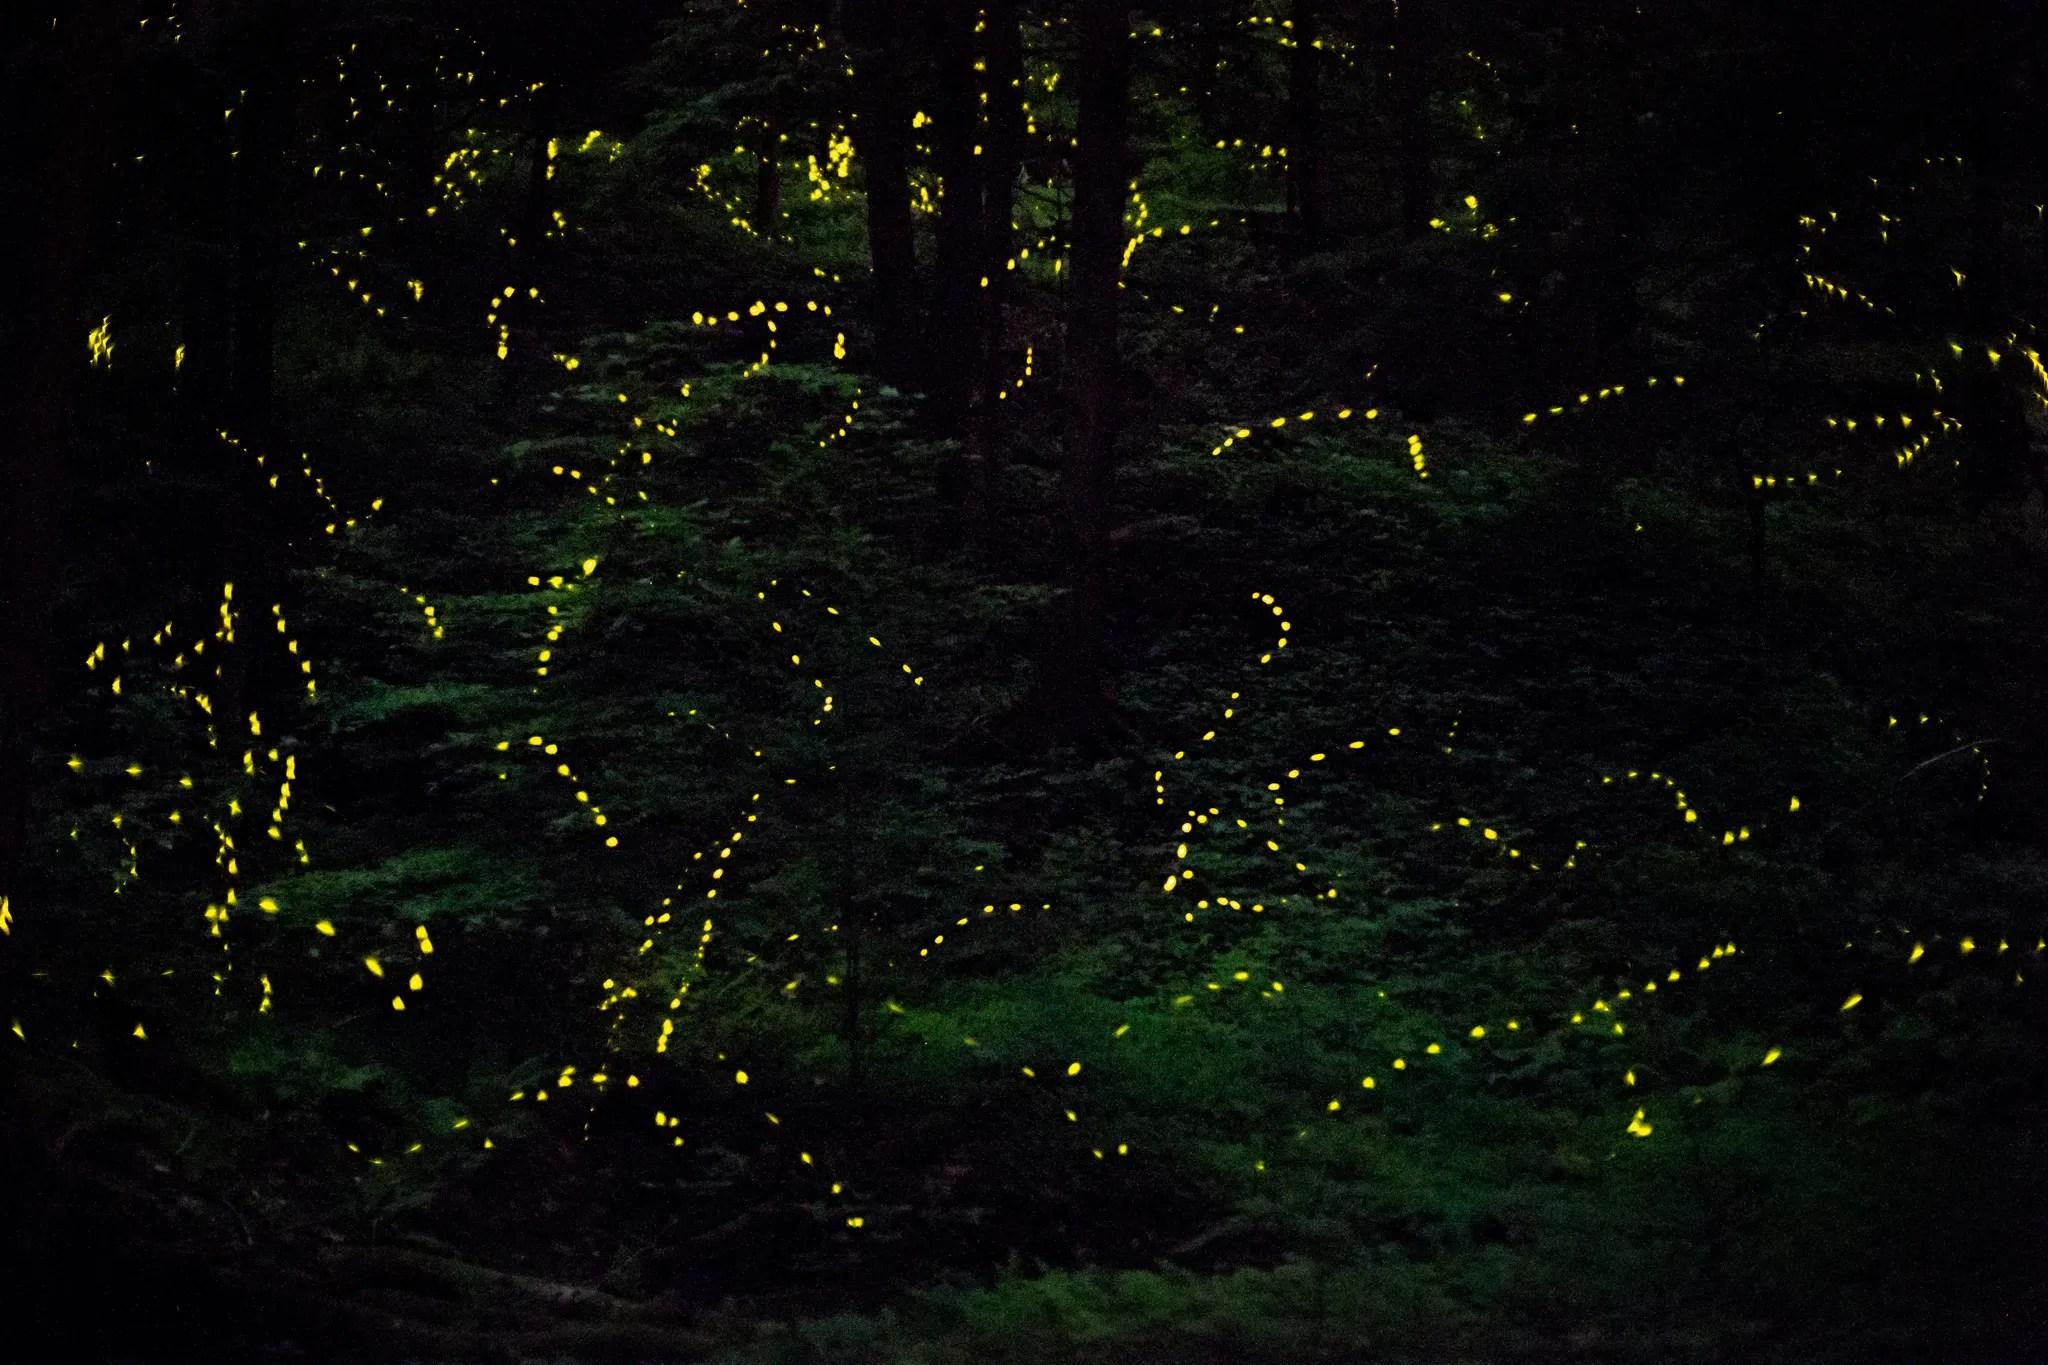 Synchronous fireflies (Photinus carolinus)